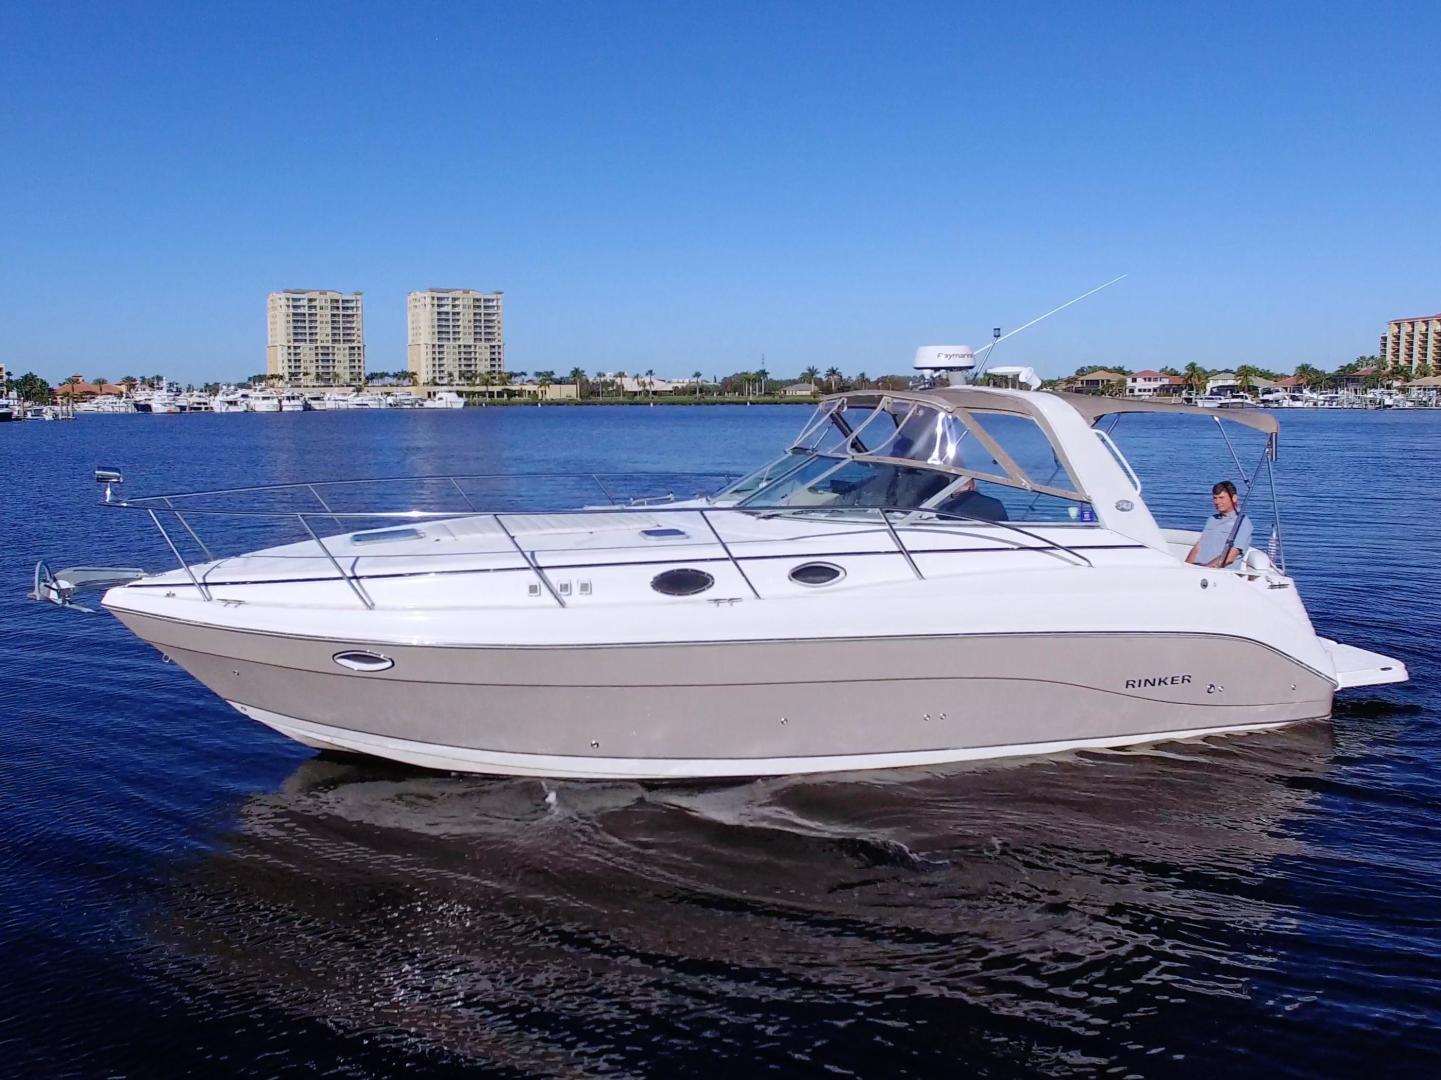 Rinker-342 Express Cruiser 2006-Salt Shaker Palmetto-Florida-United States-1587755 | Thumbnail